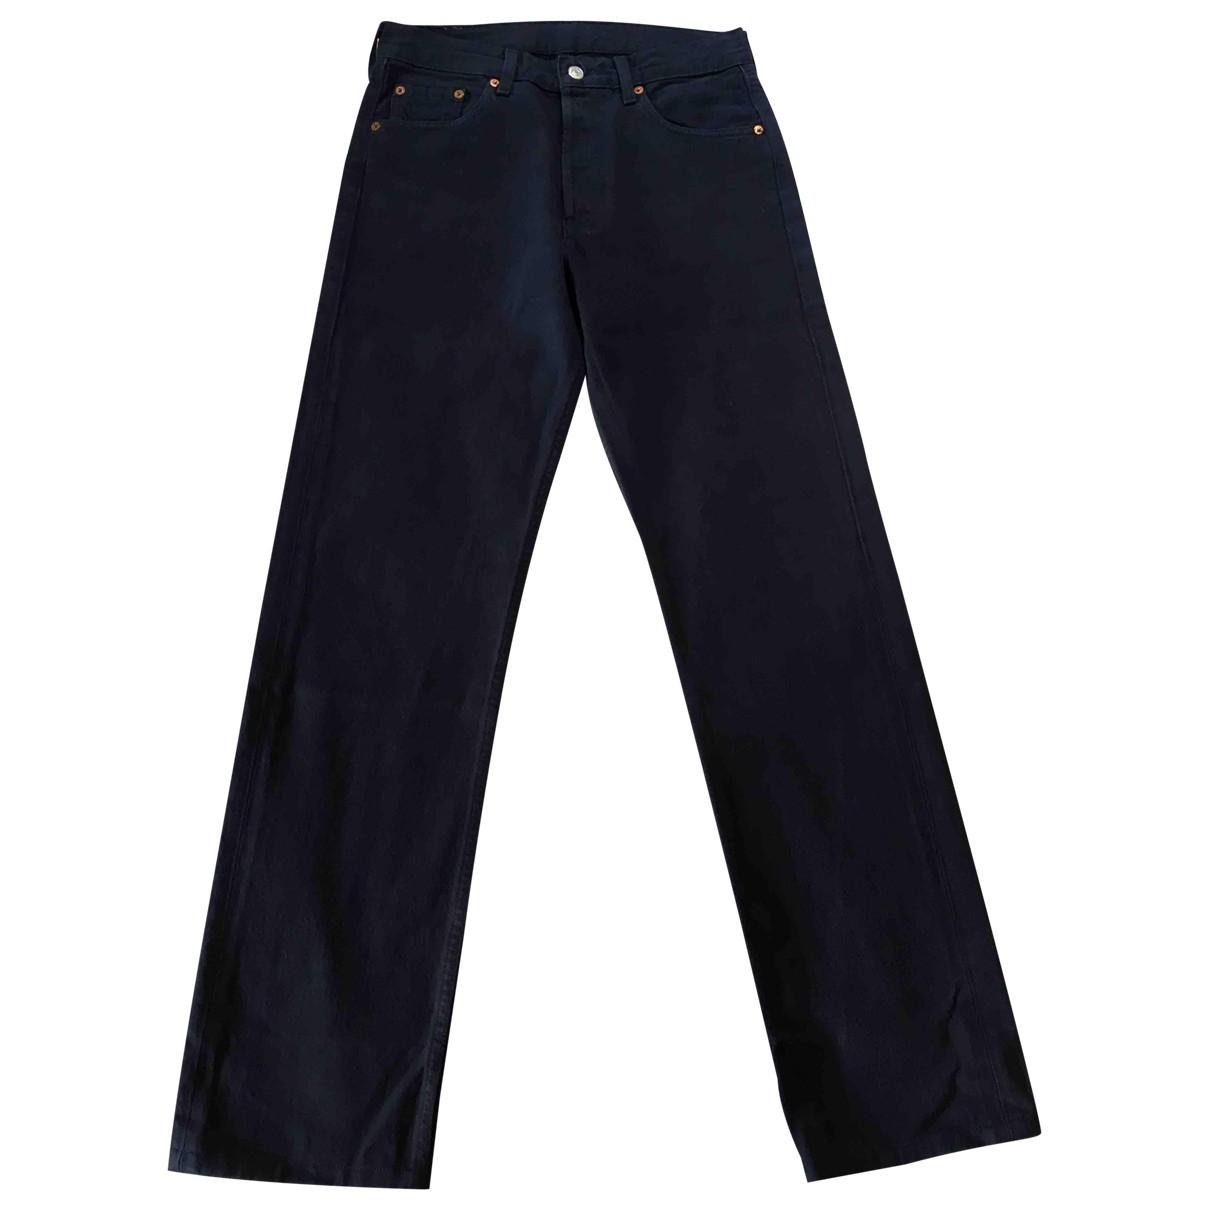 Levi's 501 Navy Cotton Jeans for Women 30 US